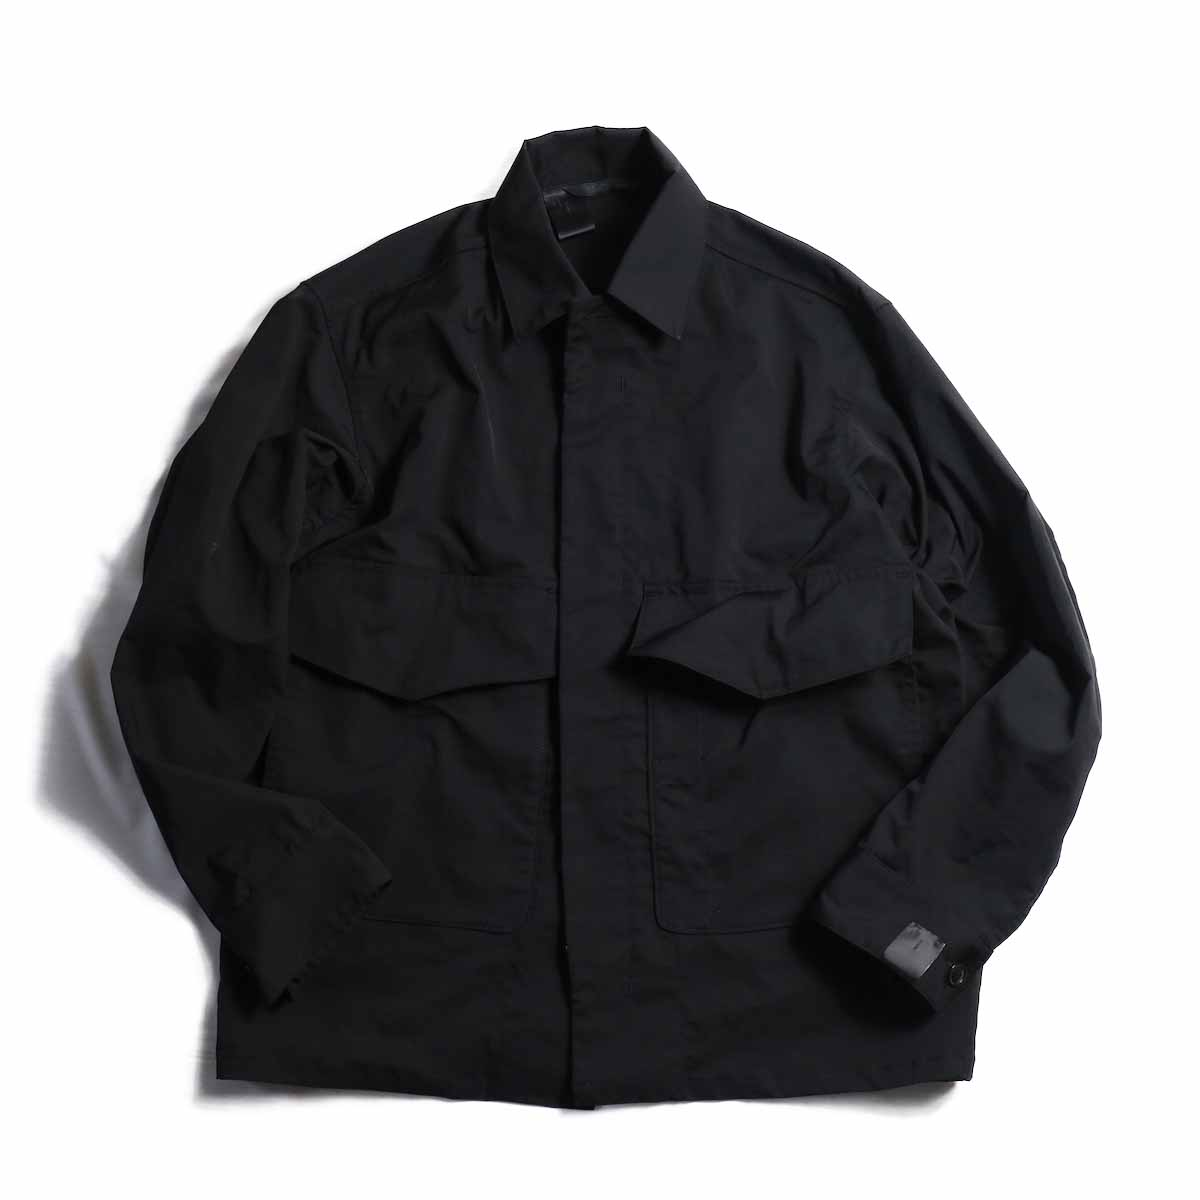 N.HOOLYWOOD / 282-BL03-016-peg LONG SLEEVE SHIRT JACKET -BLACK